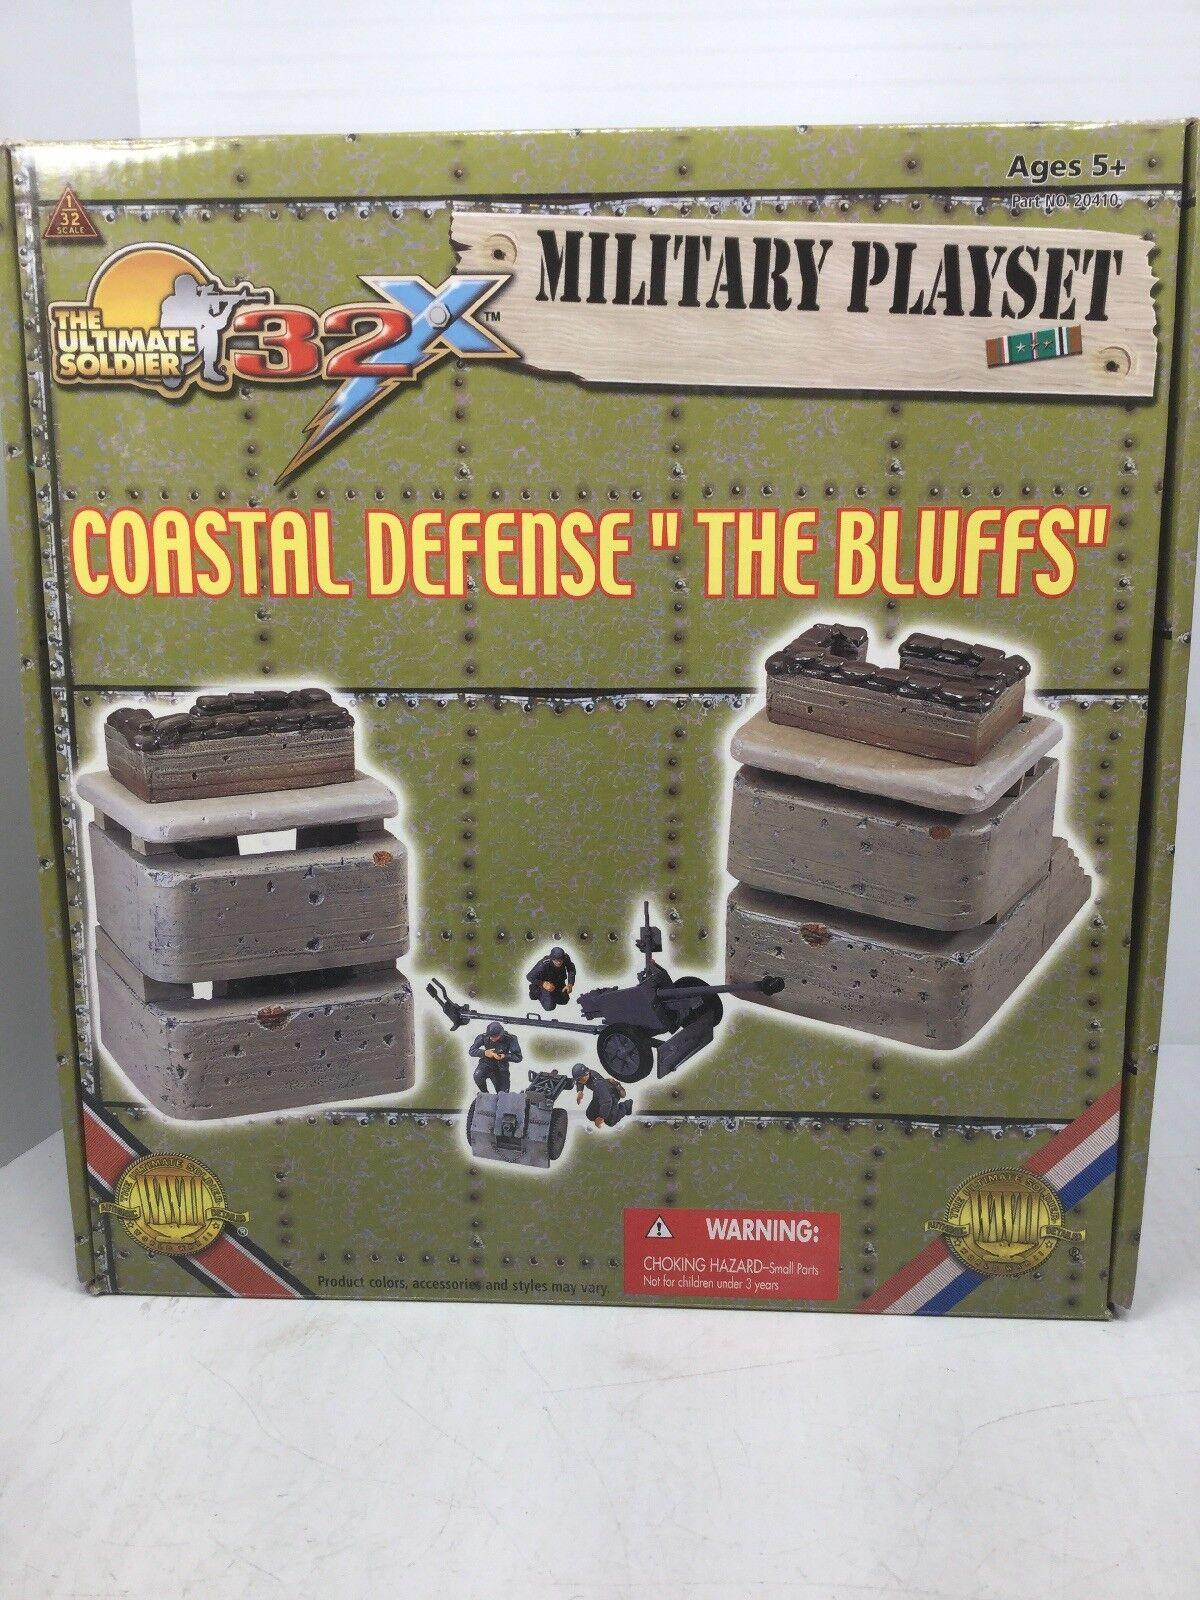 1/32 Scale Ult Soldier COASTAL DEFENSE THE BLUFFS German Playset PAK WW2 NIB